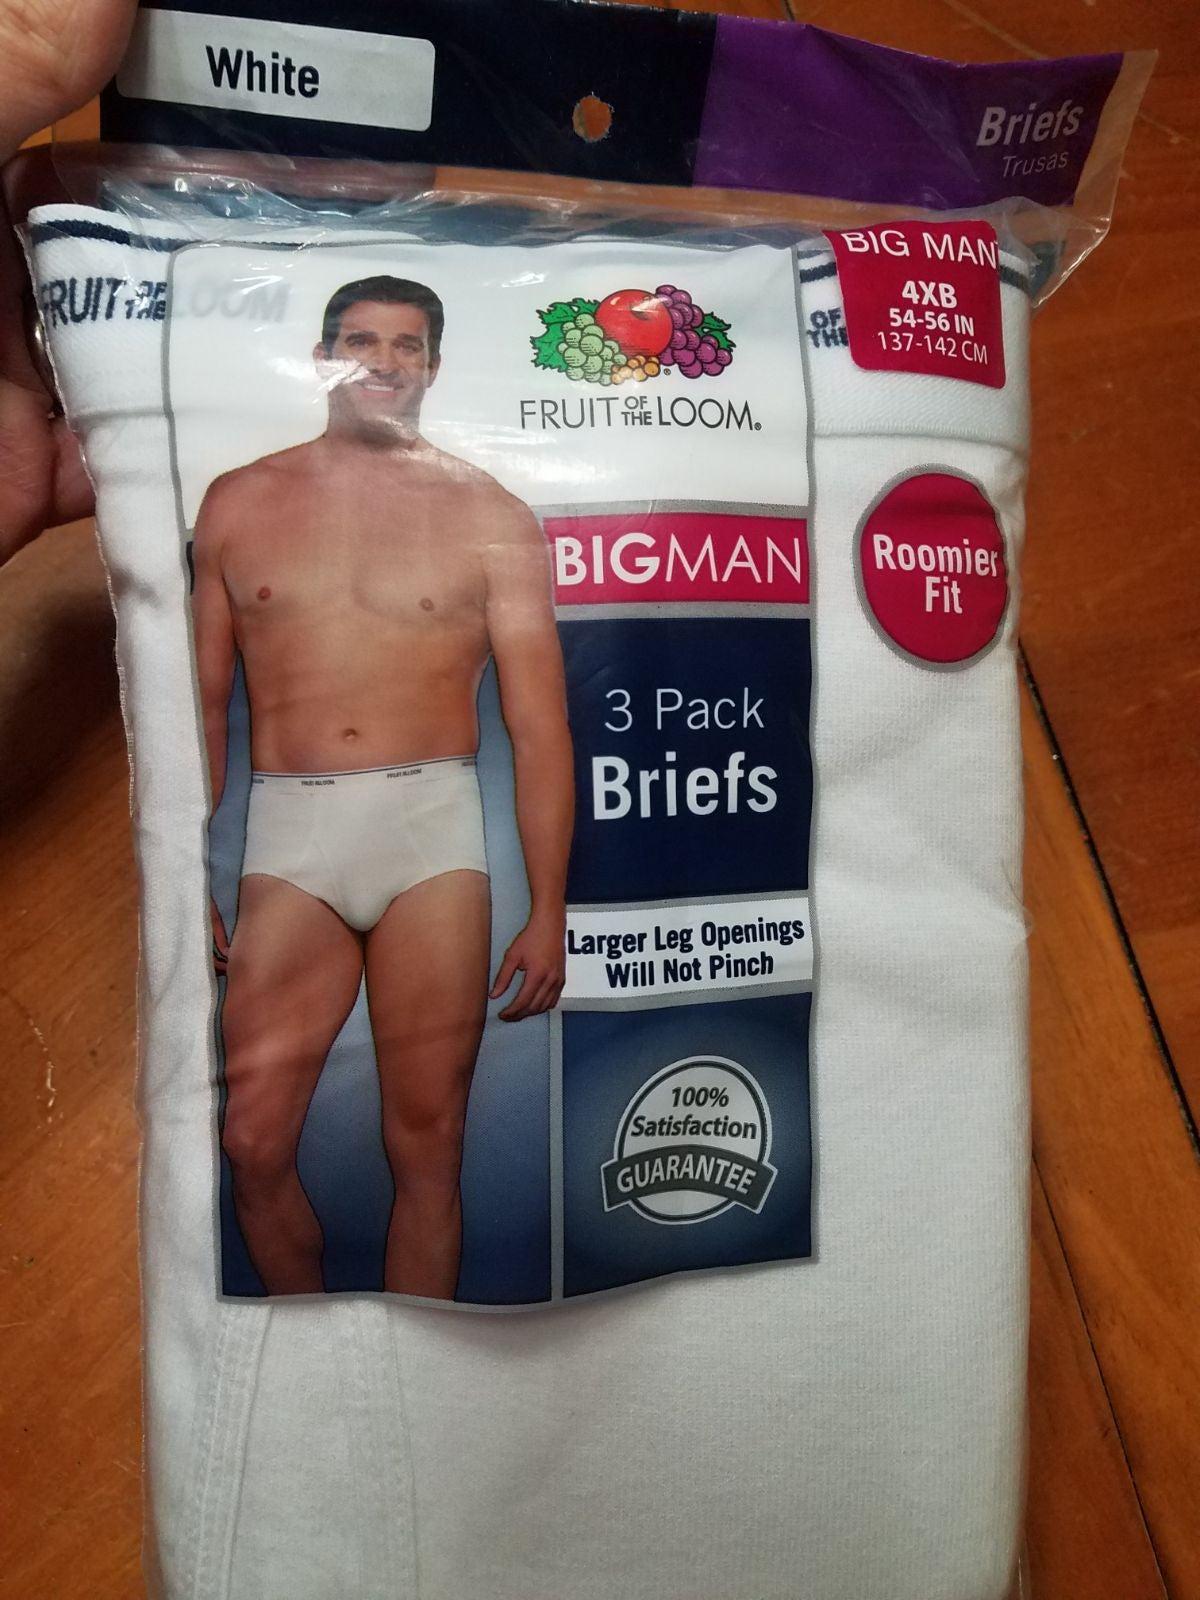 Fruit of the loom BigMan Briefs 4XB